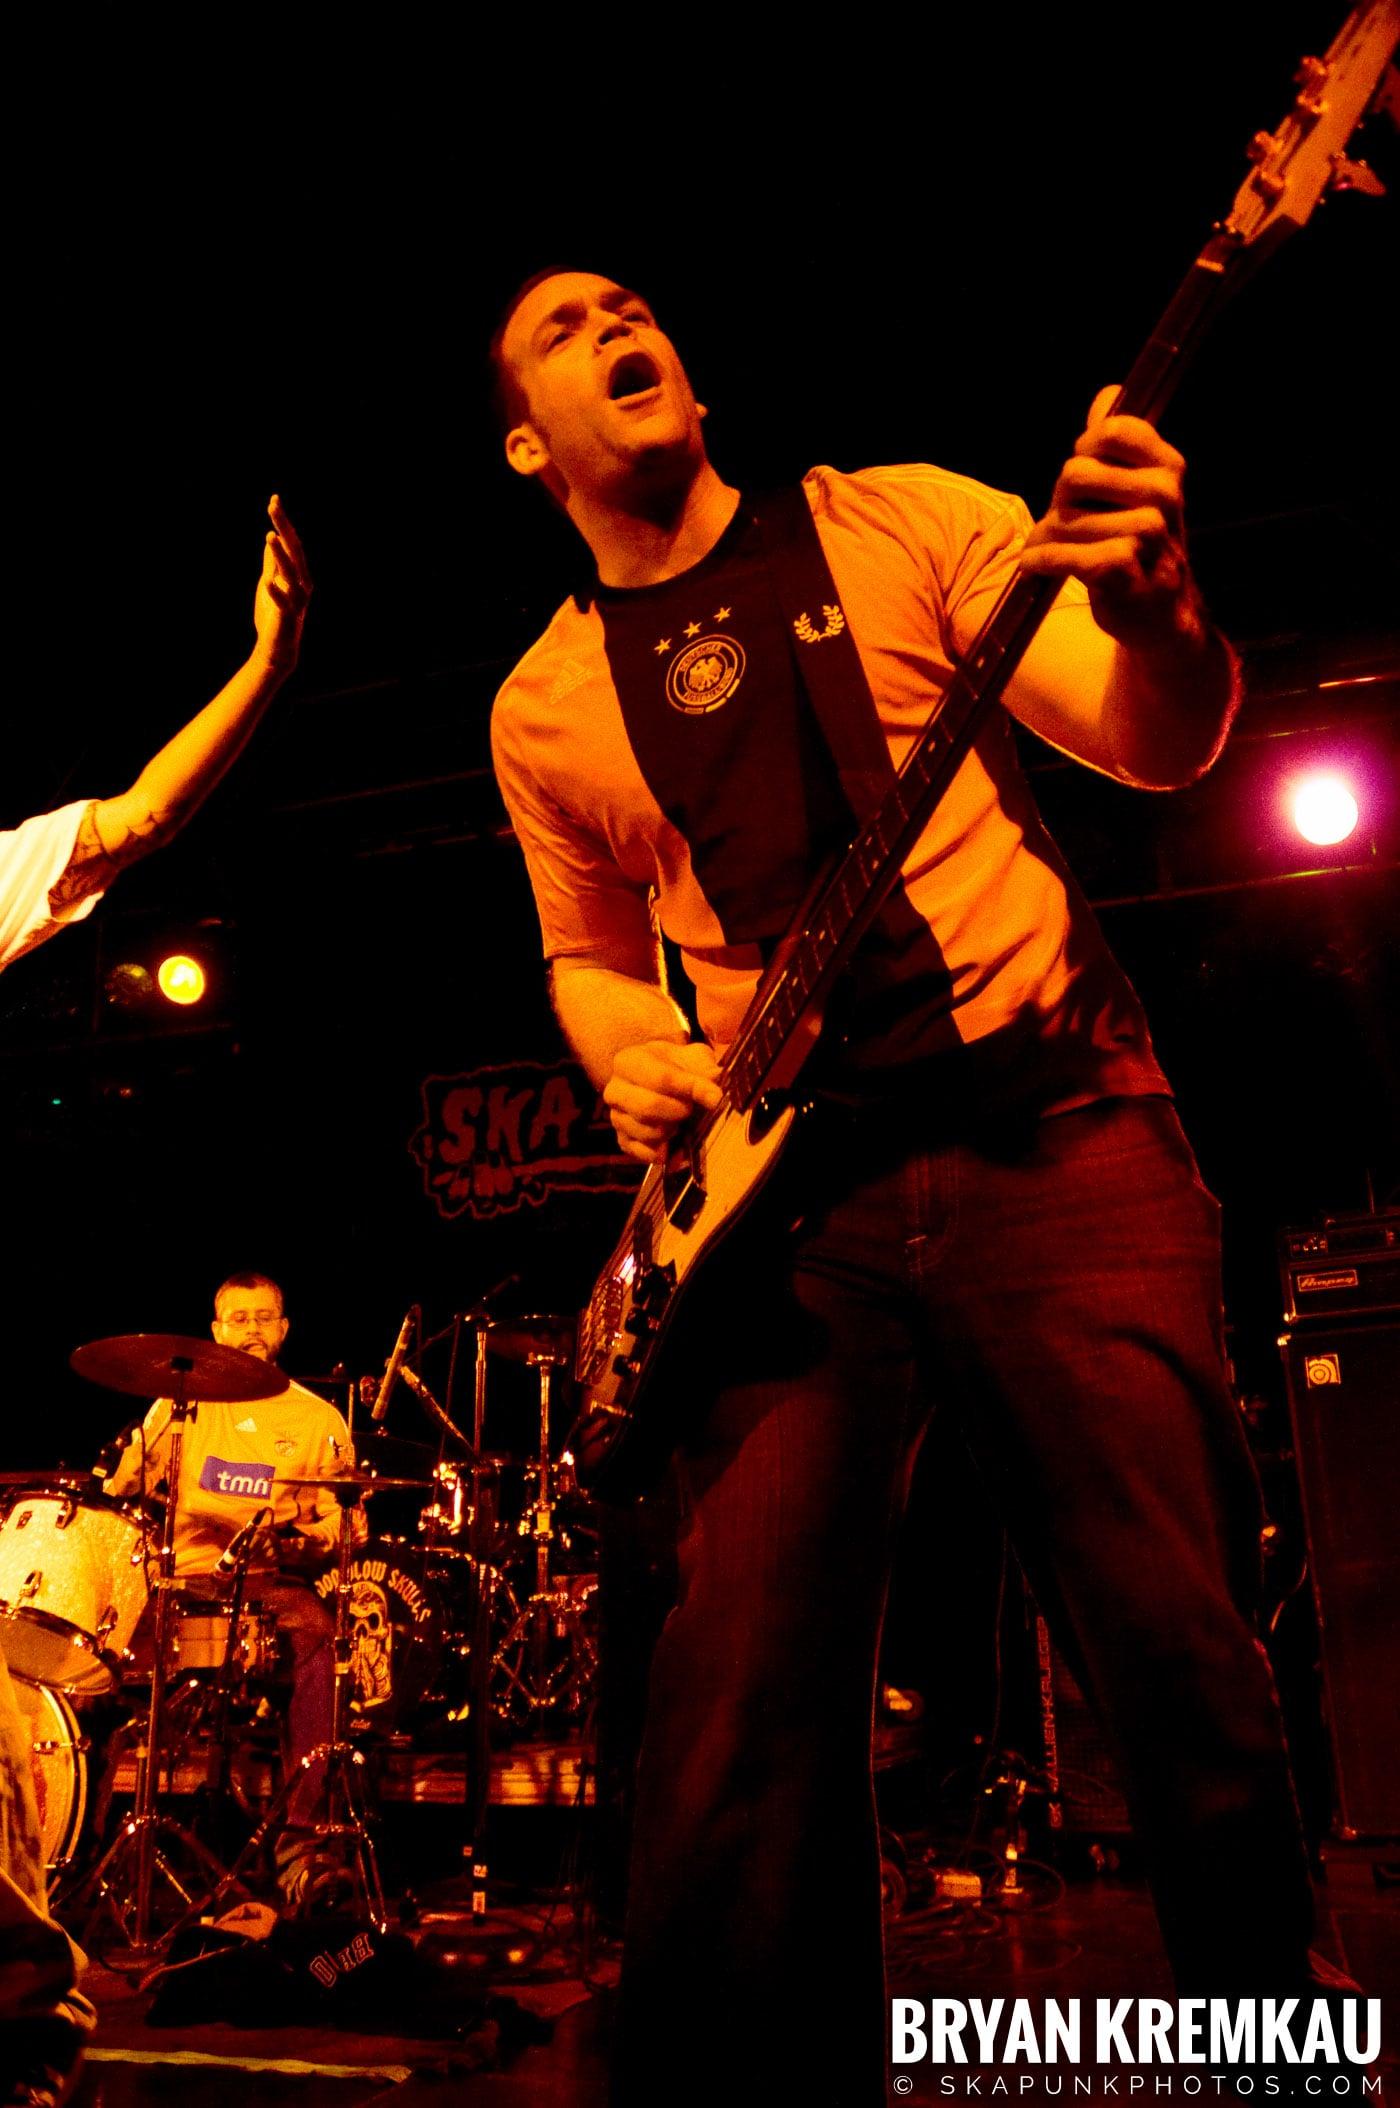 Hub City Stompers (Ska is Dead Tour) @ Starland Ballroom, Sayreville, NJ - 11.15.09 (14)